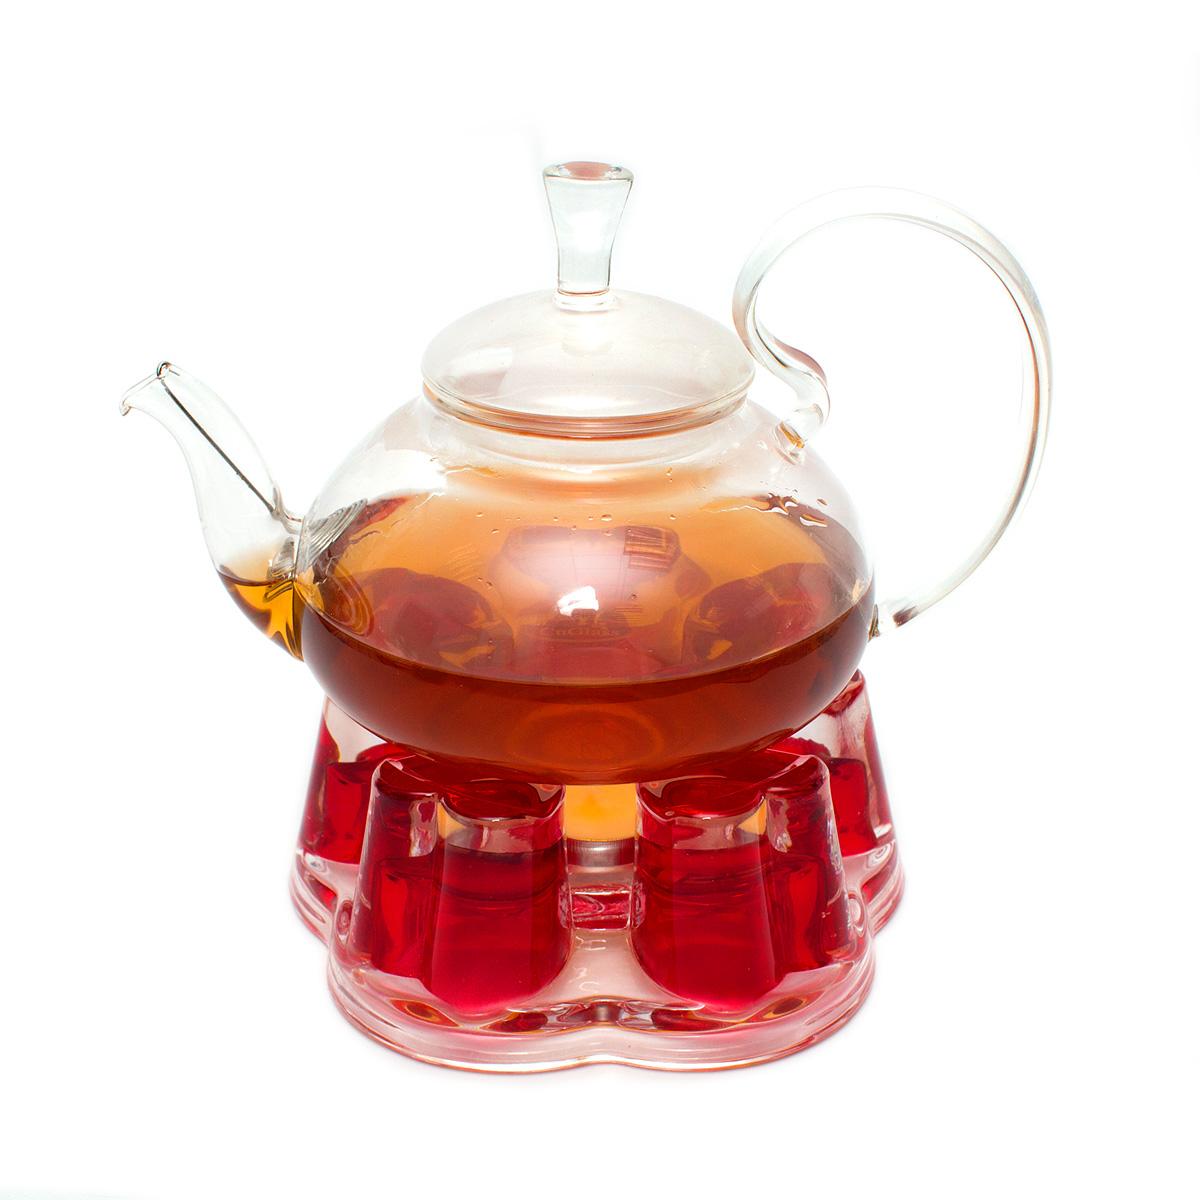 Набор: чайник Астра 680 мл и подставка-подогреватель Агава красная